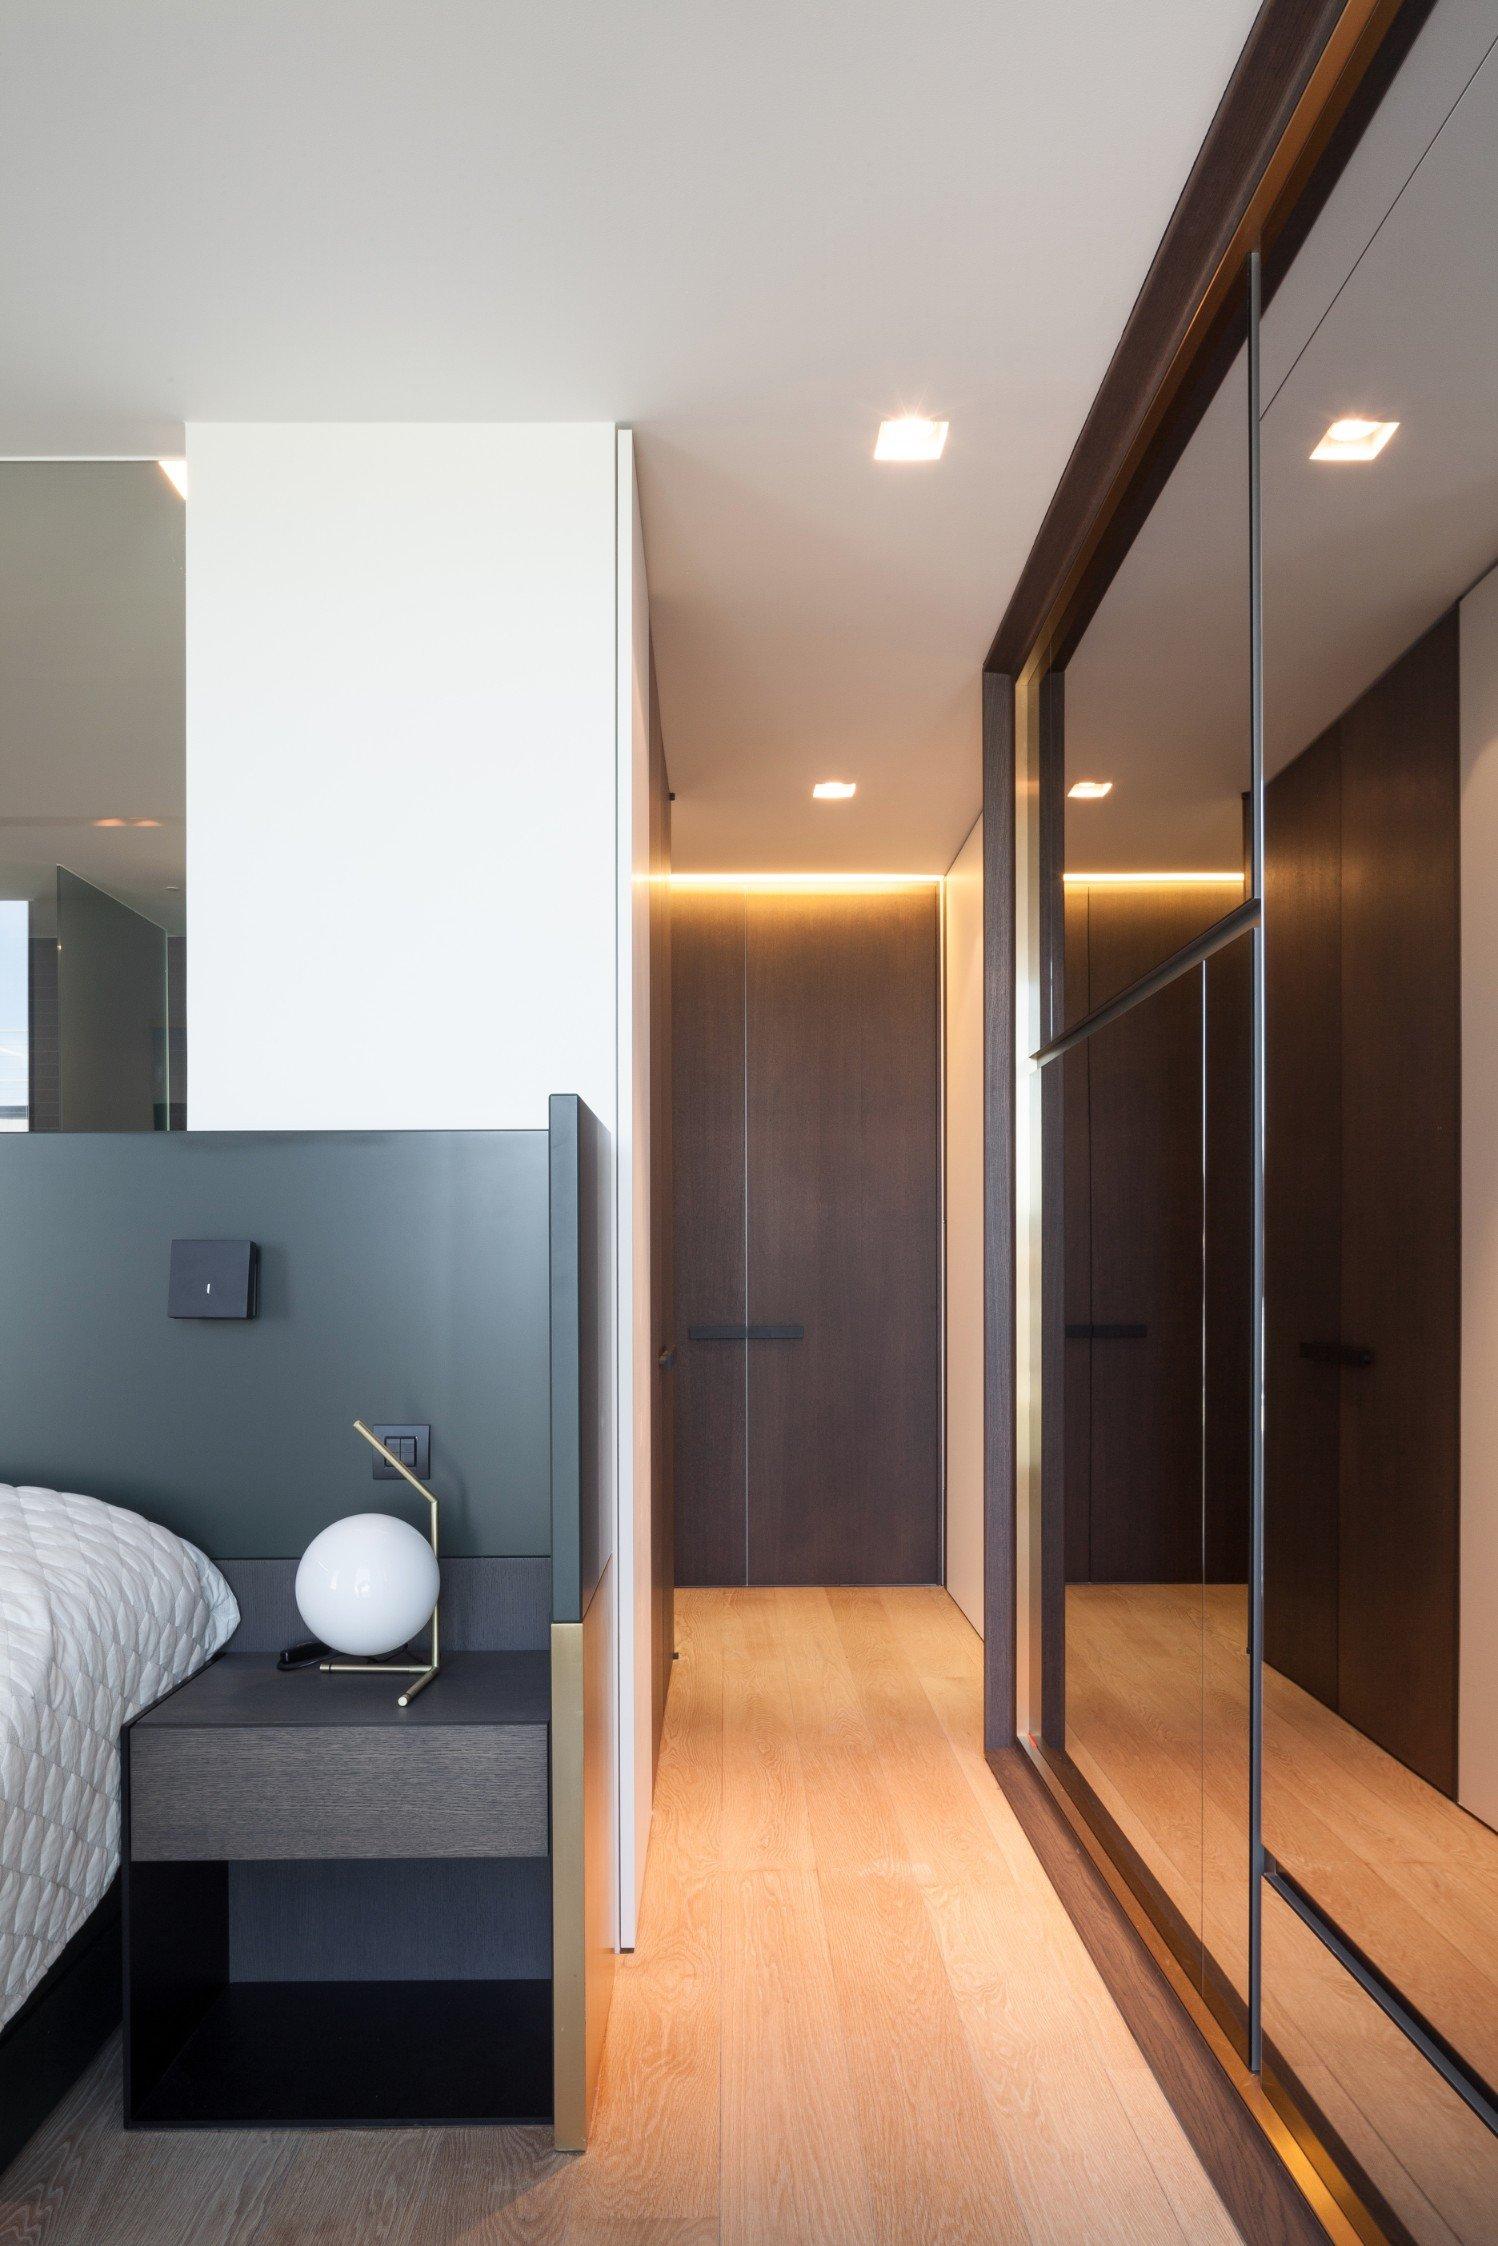 Rietveldprojects-penthouse-appartement-design-architectuur-kust11